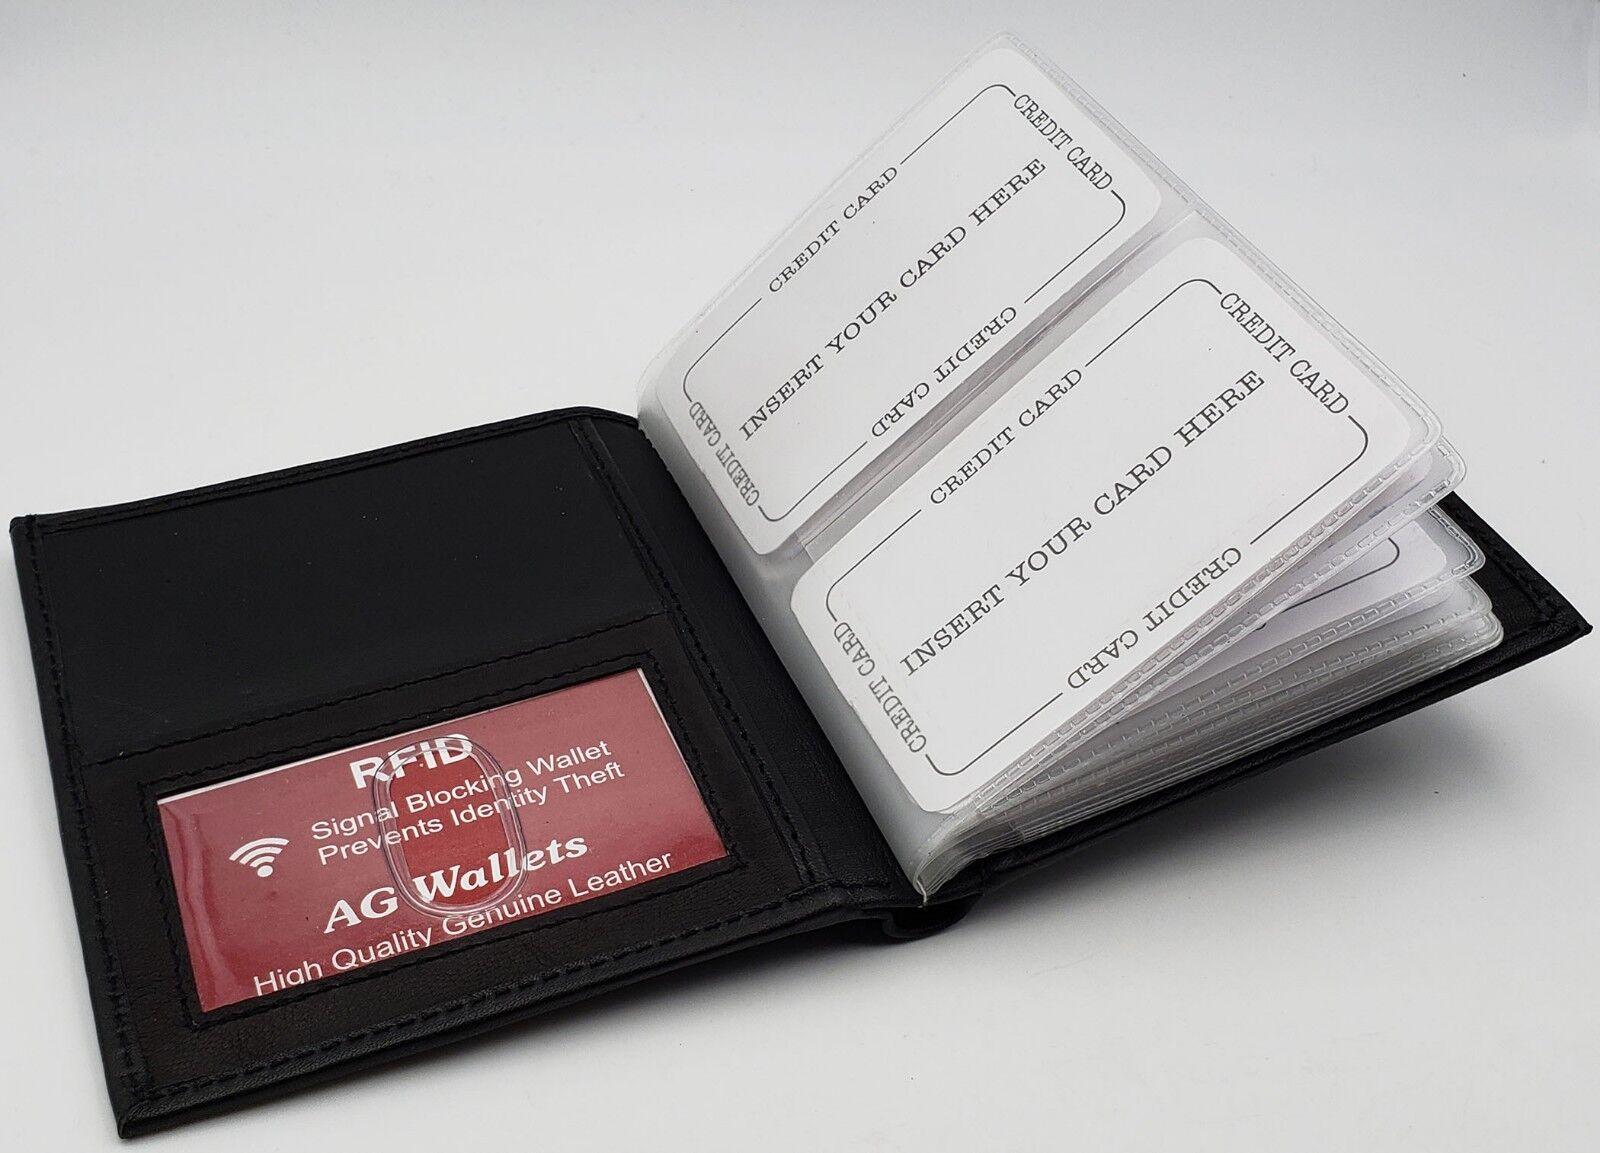 b0fd28ec4ec7 RFID Signal Blocking Leather European Hipster 24 Credit Card 2id Billfold  Wallet